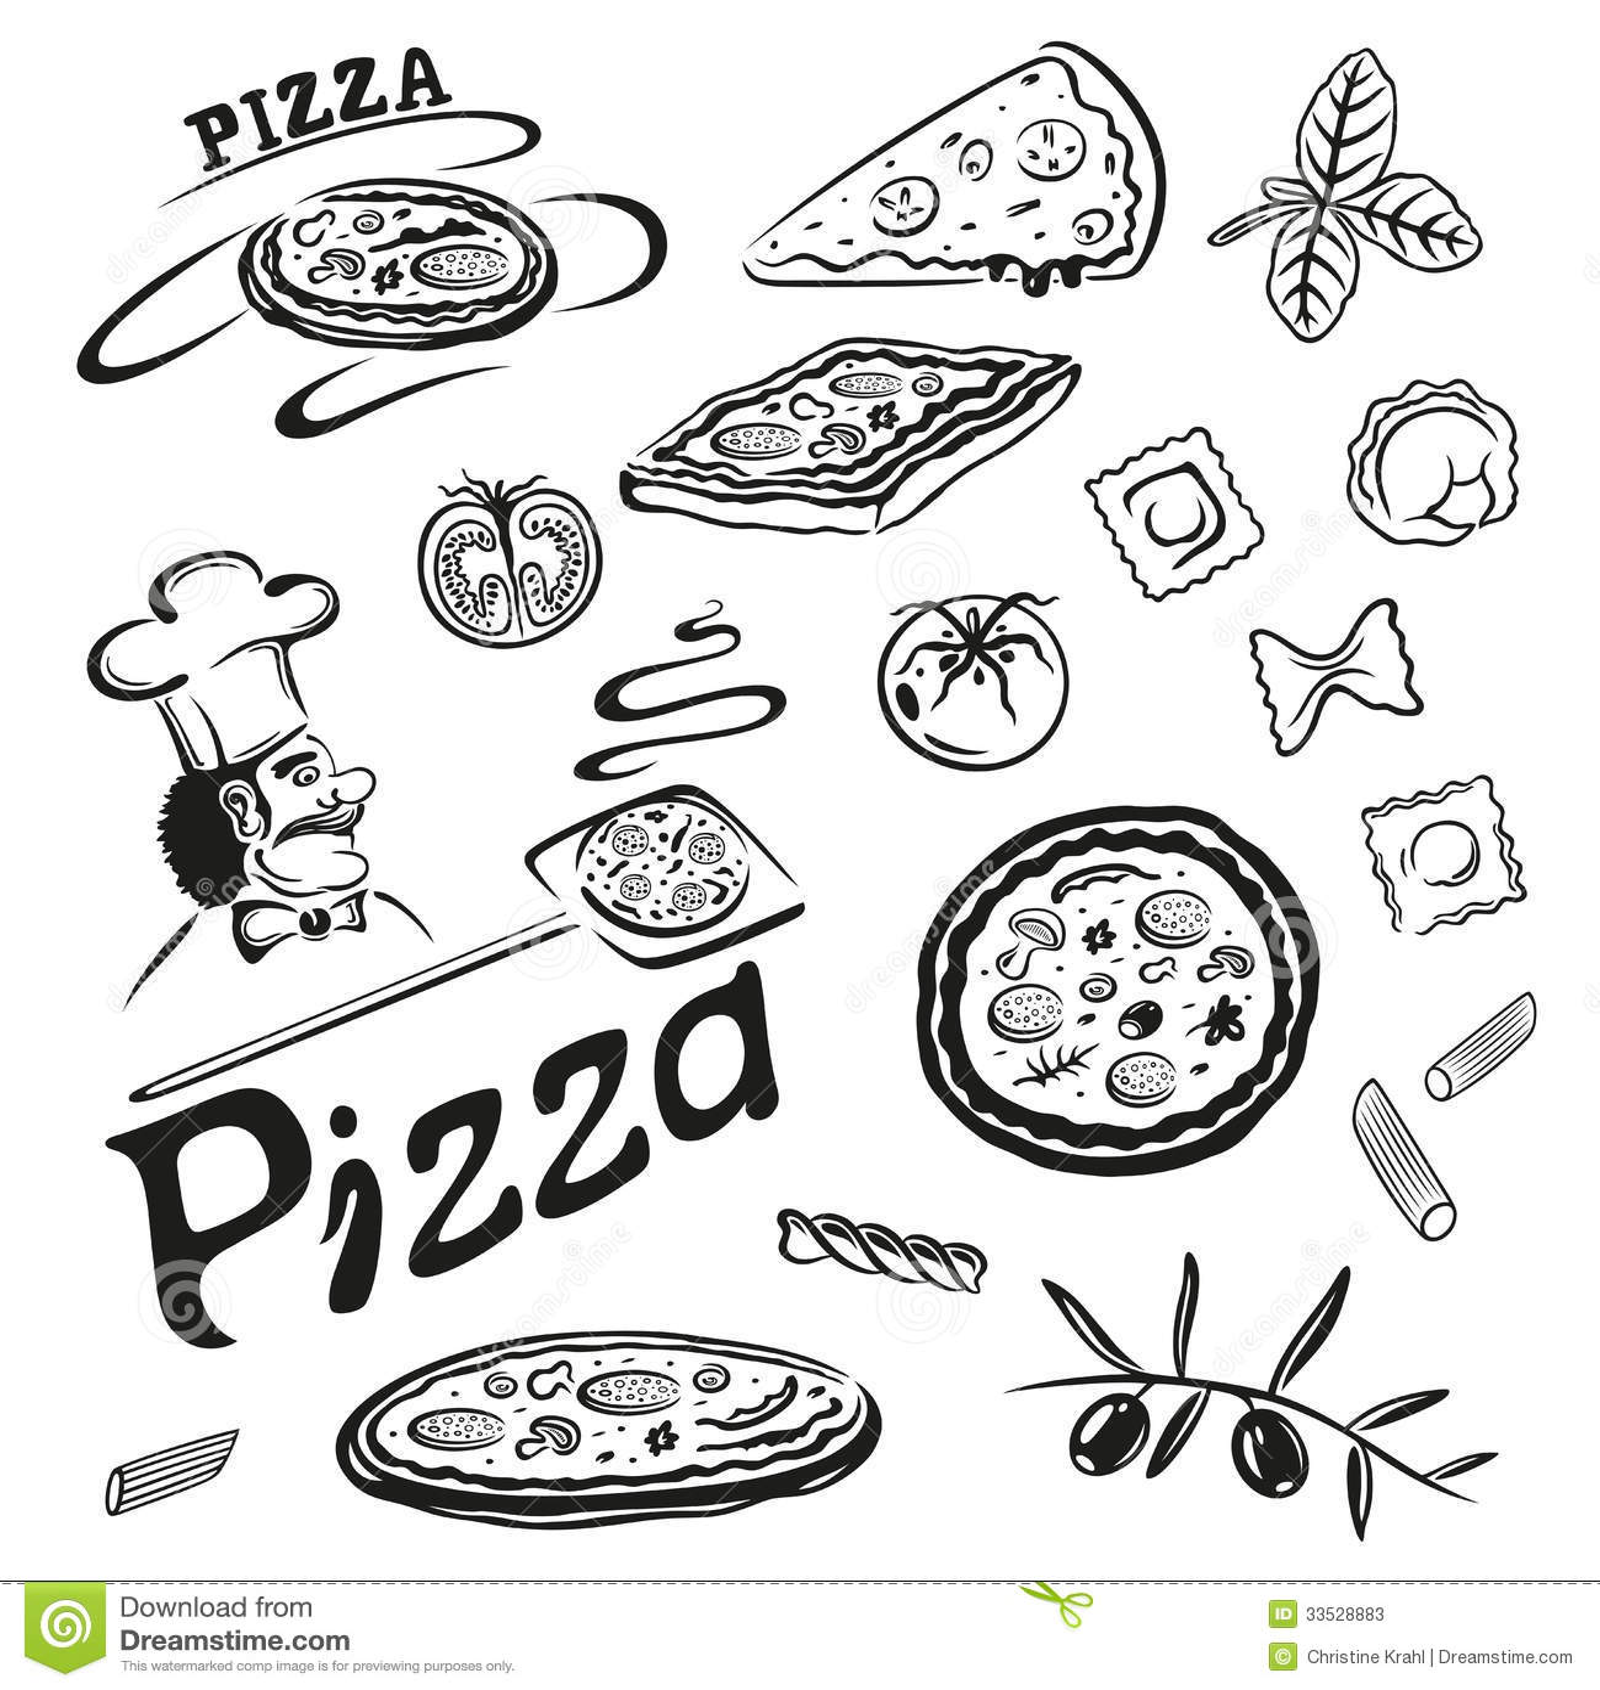 Pizza Pasta Stock Photos